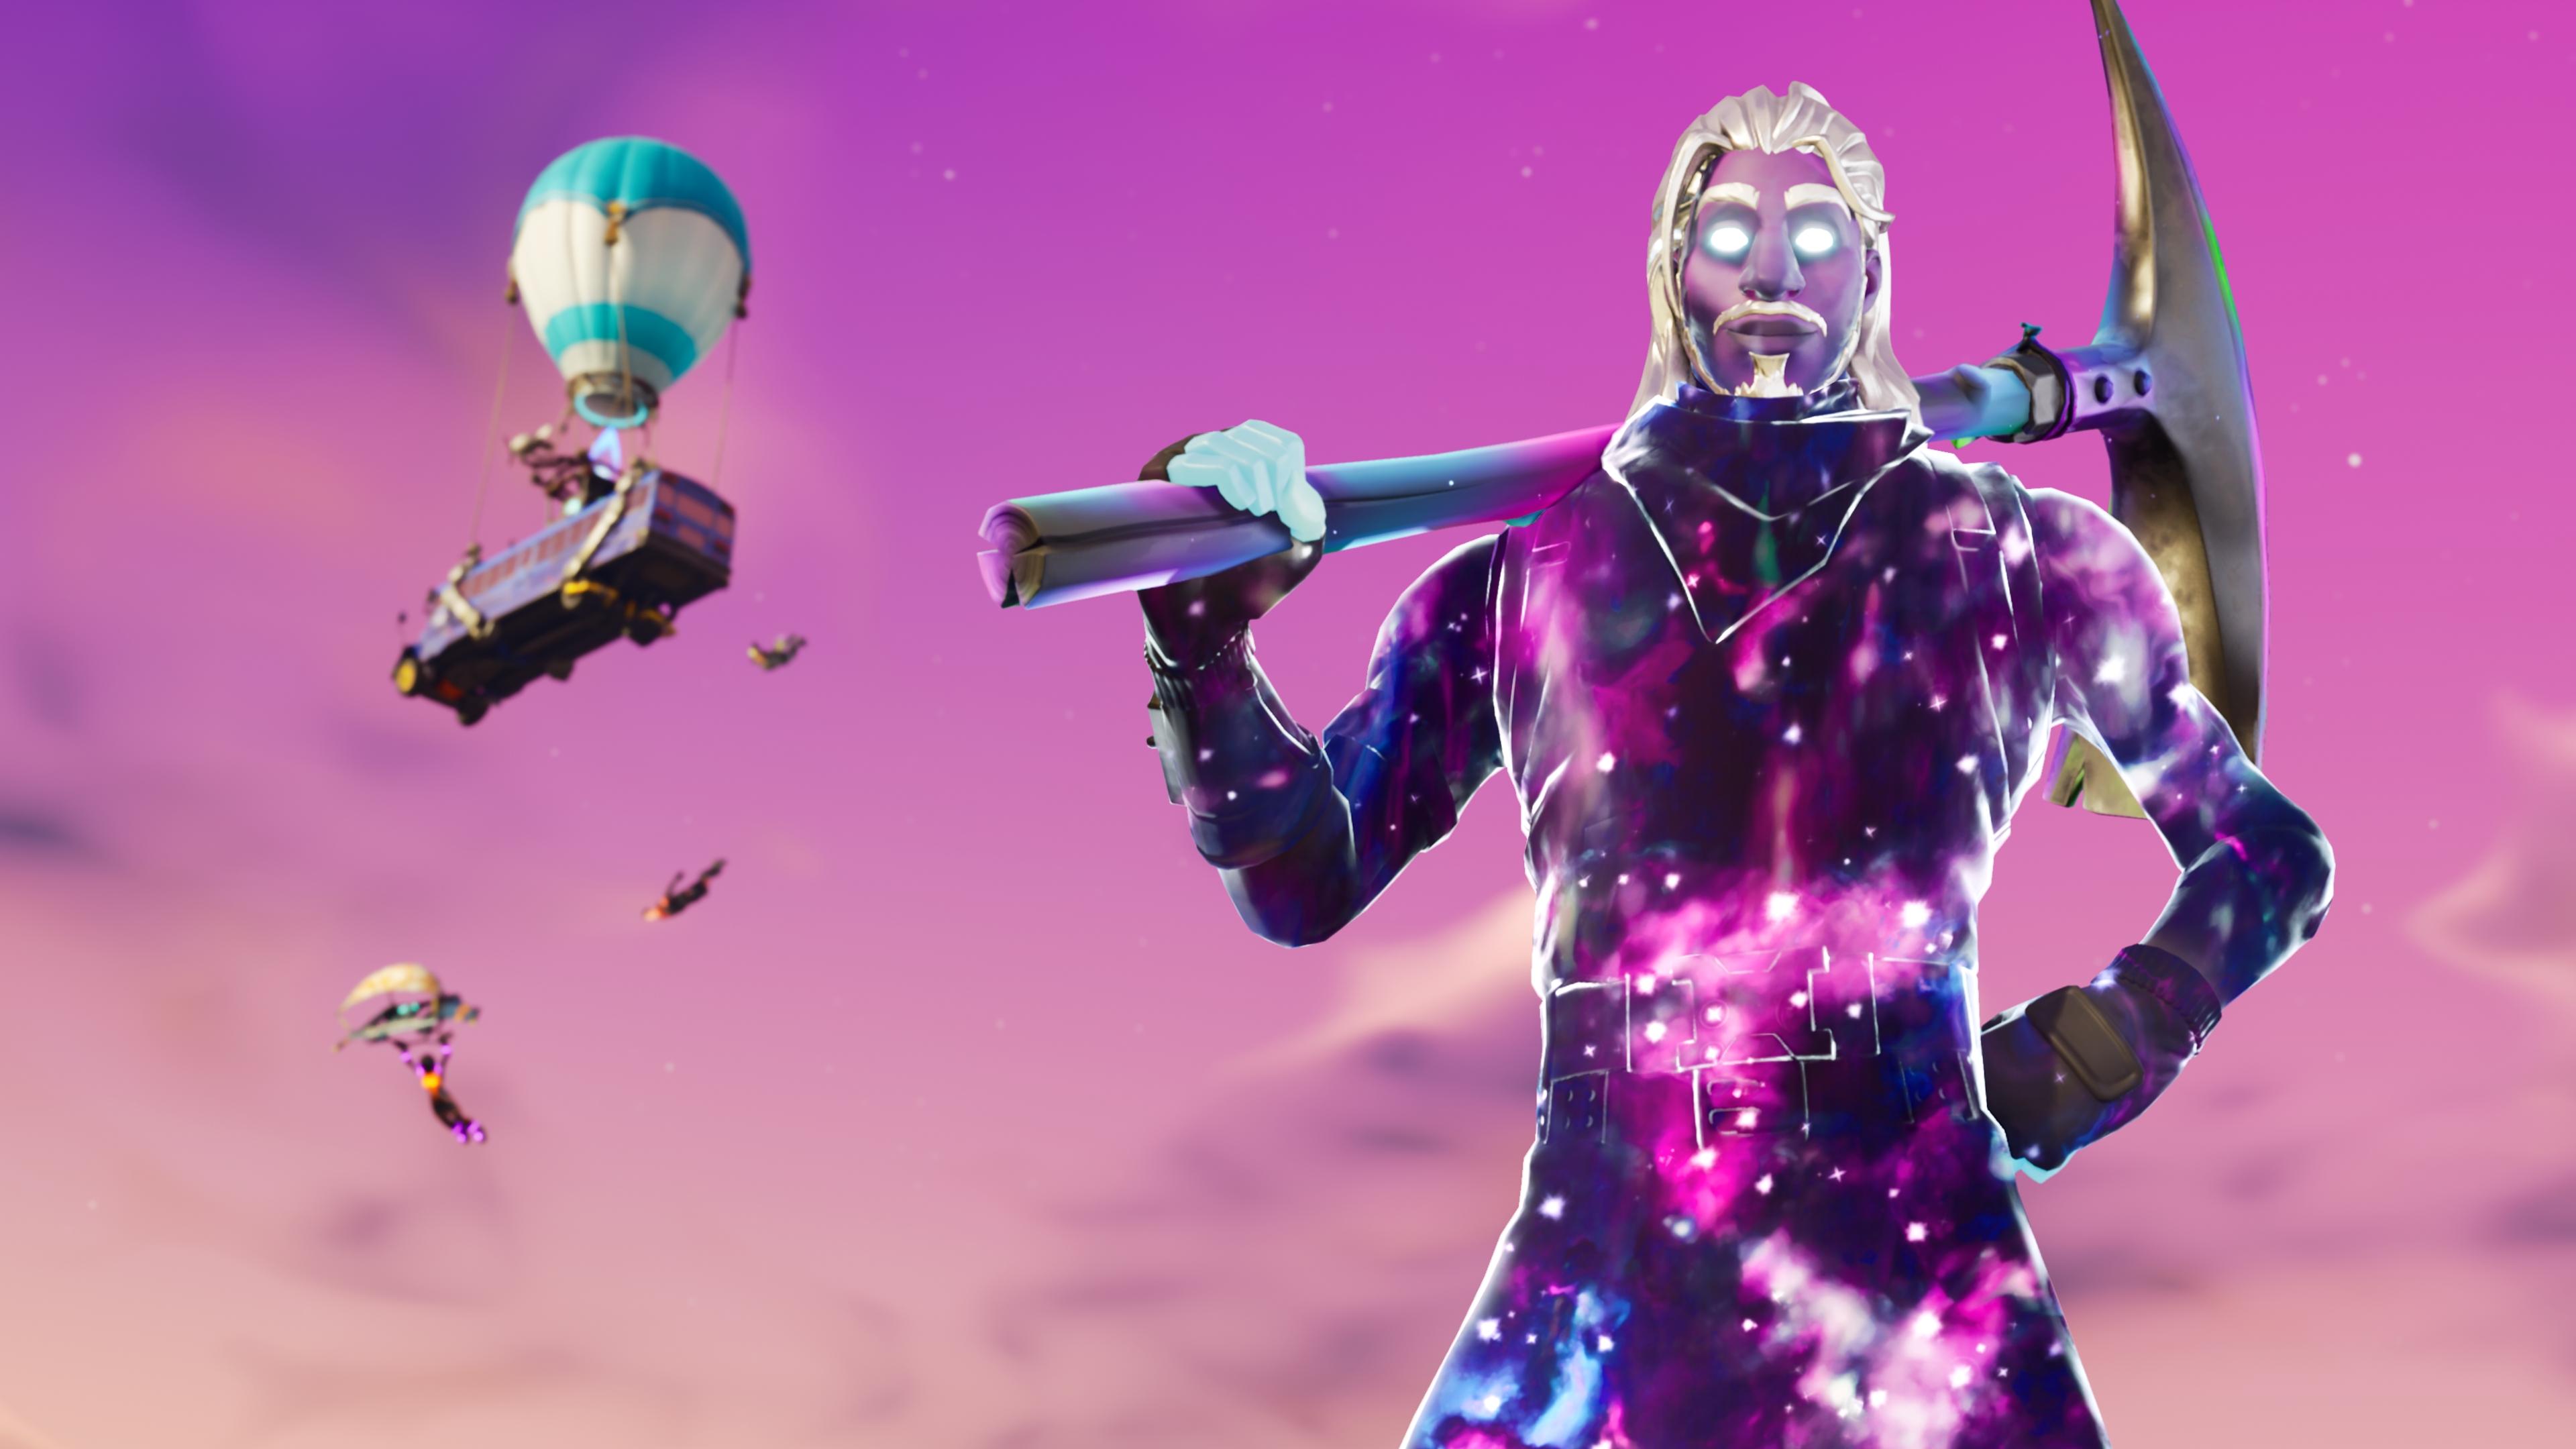 Galaxy Man Fortnite Season 6 4k Hd Games 4k Wallpapers